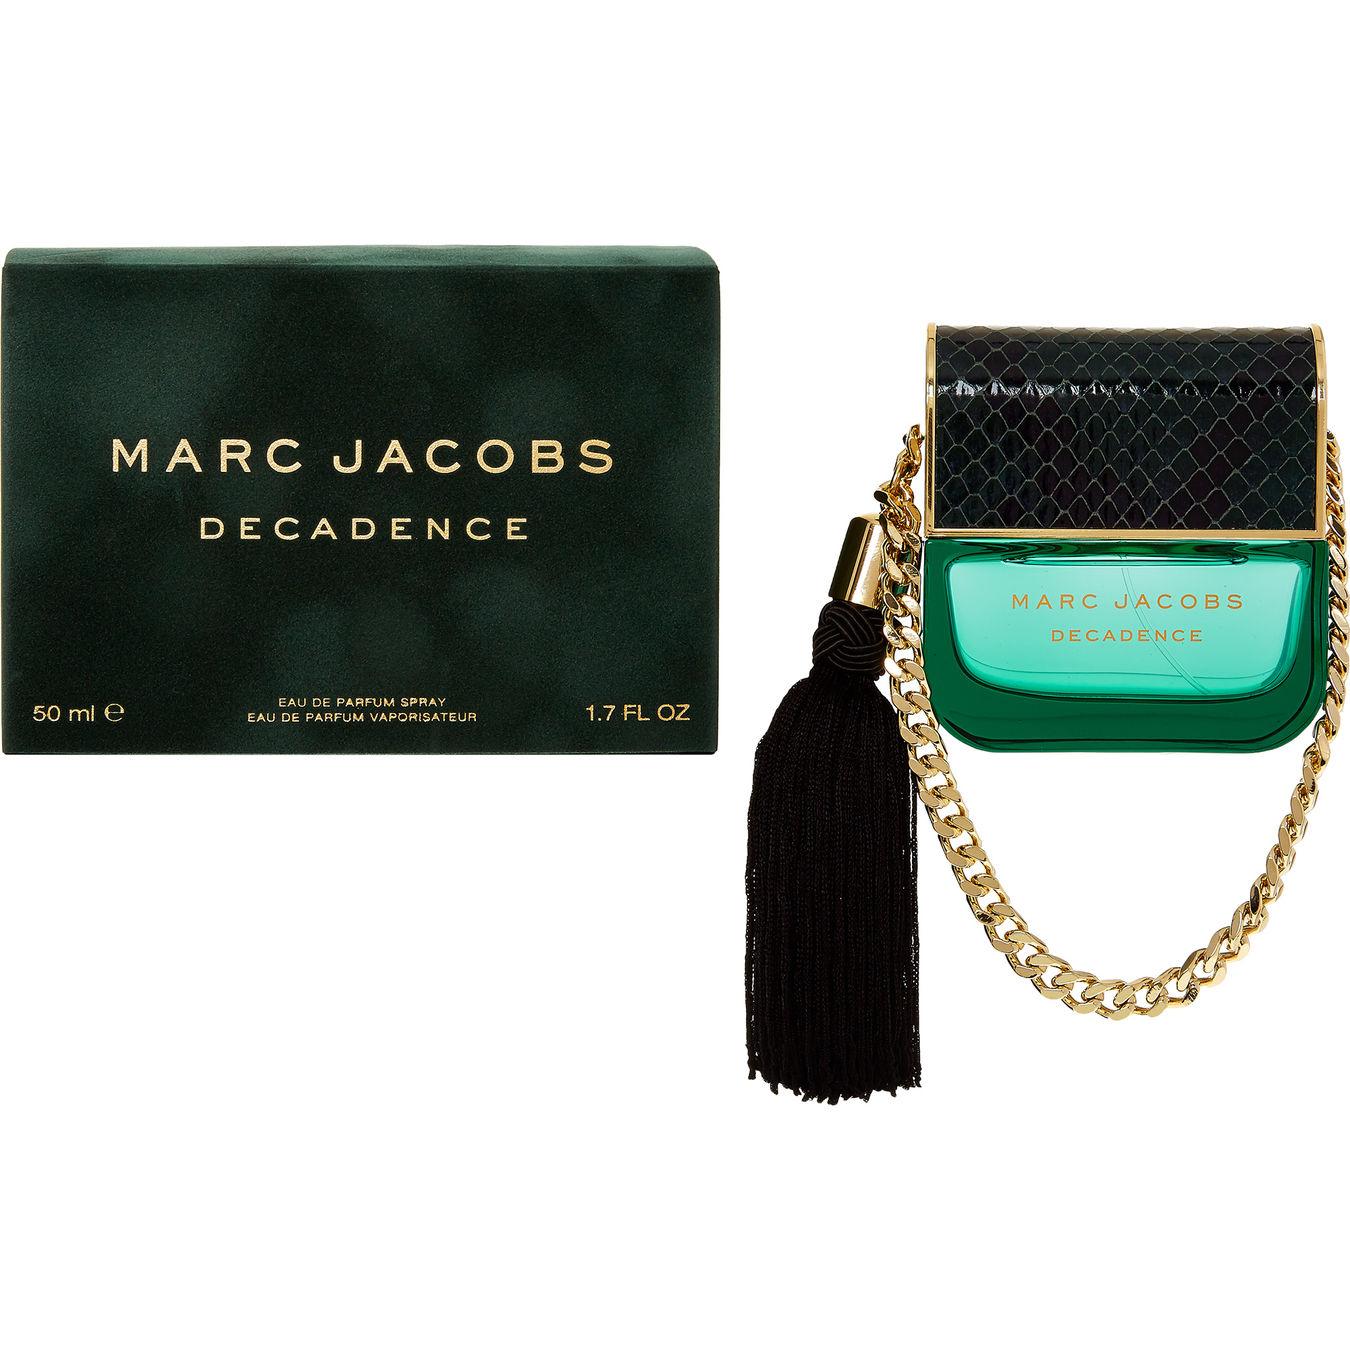 Marc Jacobs Perfume £44 @tk maxx online